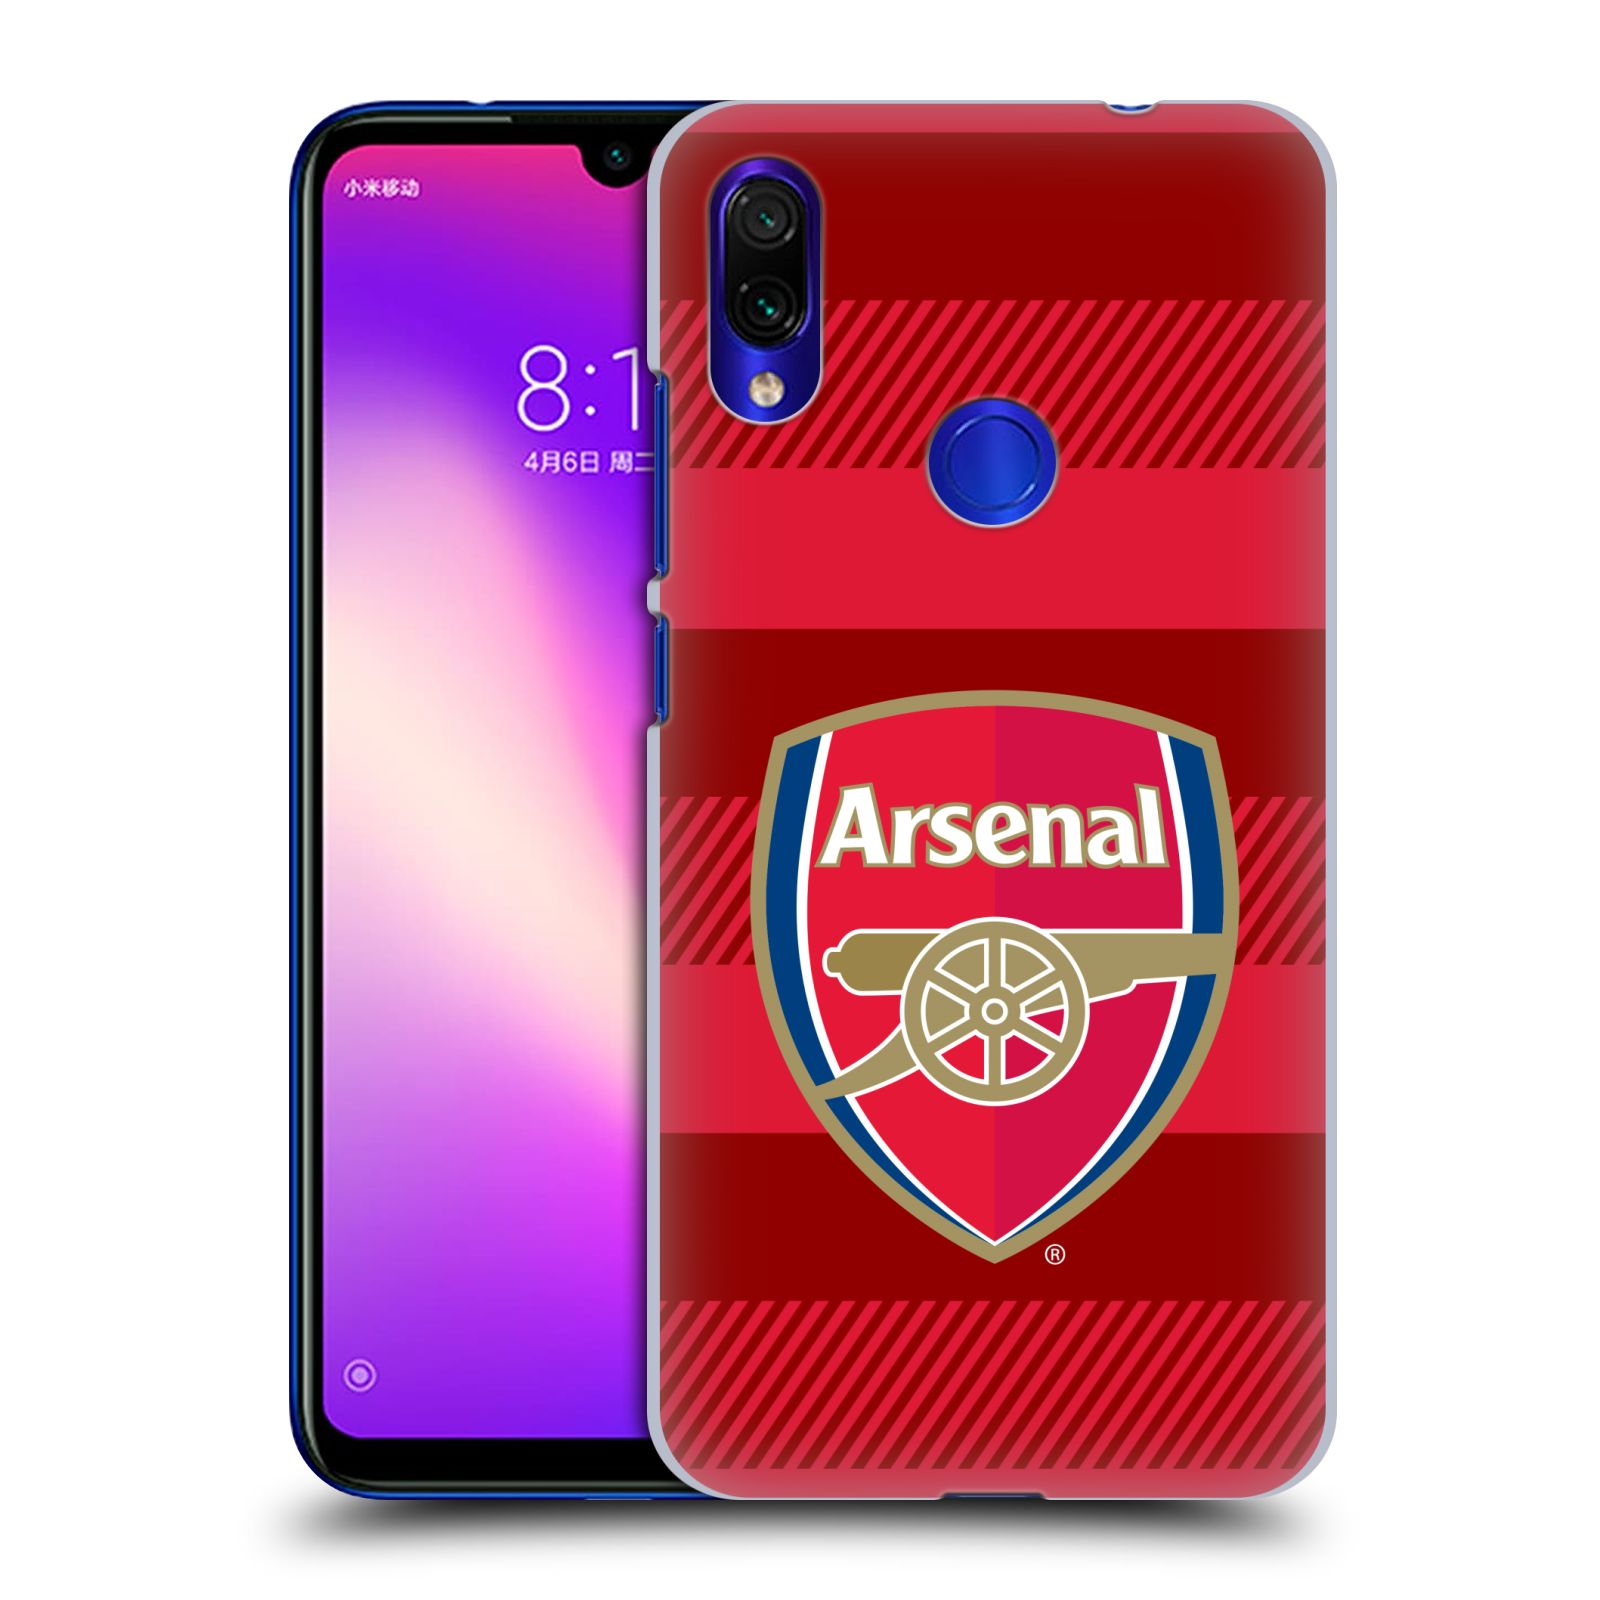 Plastové pouzdro na mobil Xiaomi Redmi Note 7 - Head Case - Arsenal FC - Logo s pruhy